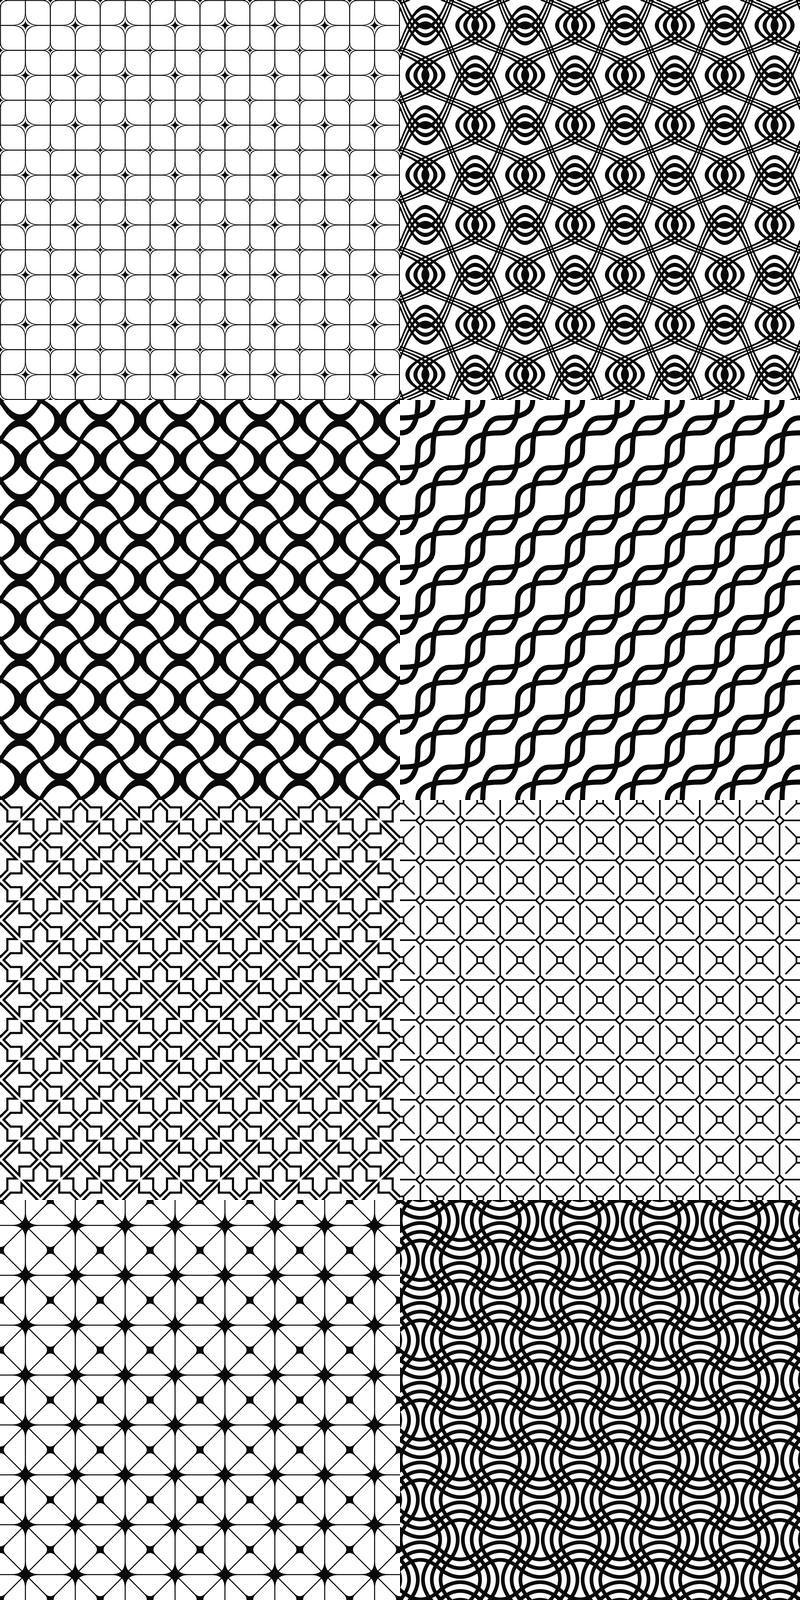 90 Vector Grid Patterns Black And White Pattern Background Collection Eps Jpg Grid Design Pattern Geometric Pattern Design Monochrome Pattern